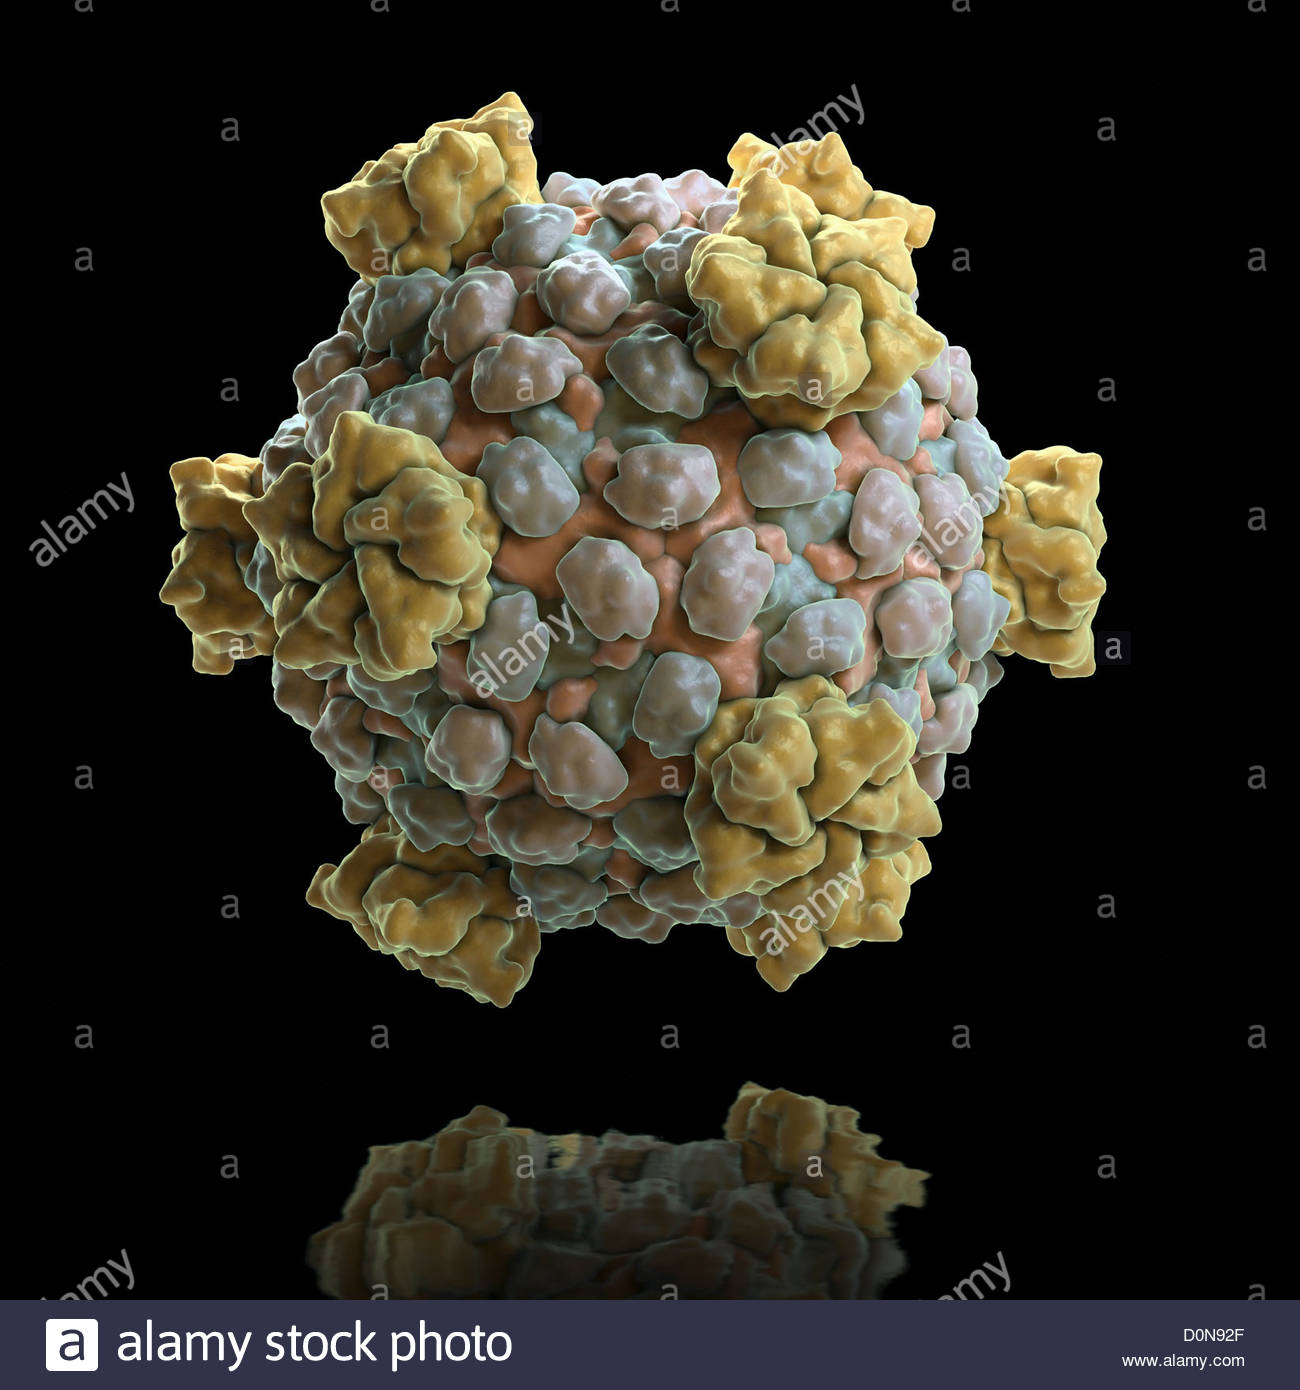 Infectious component of celiac disease?